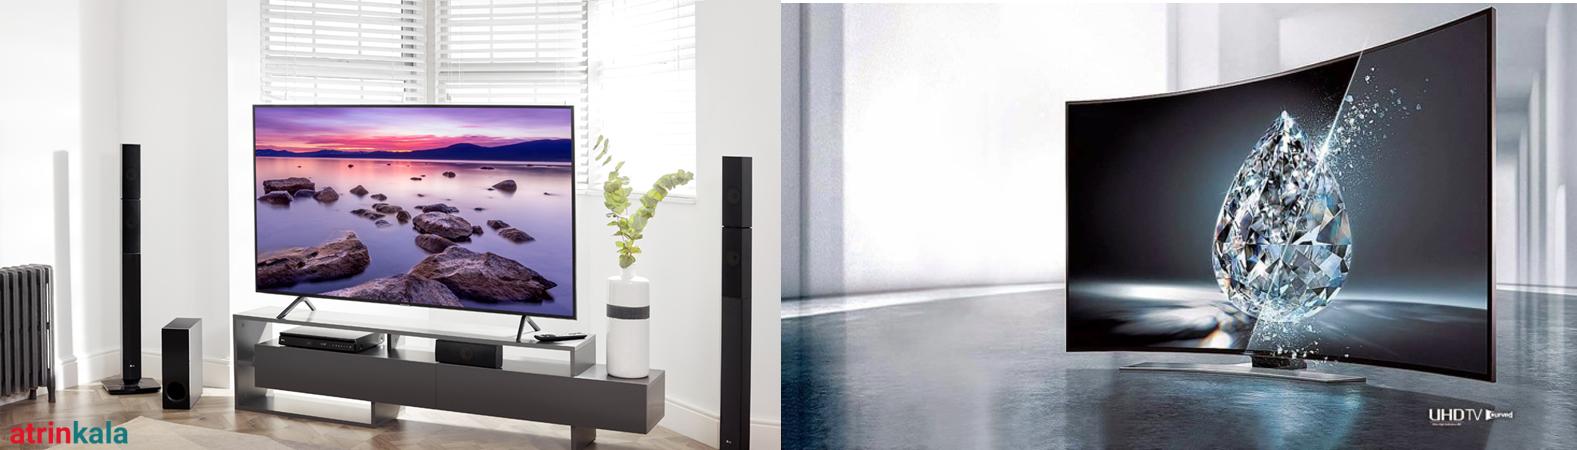 تفاوت تلویزیون تخت با منحنی